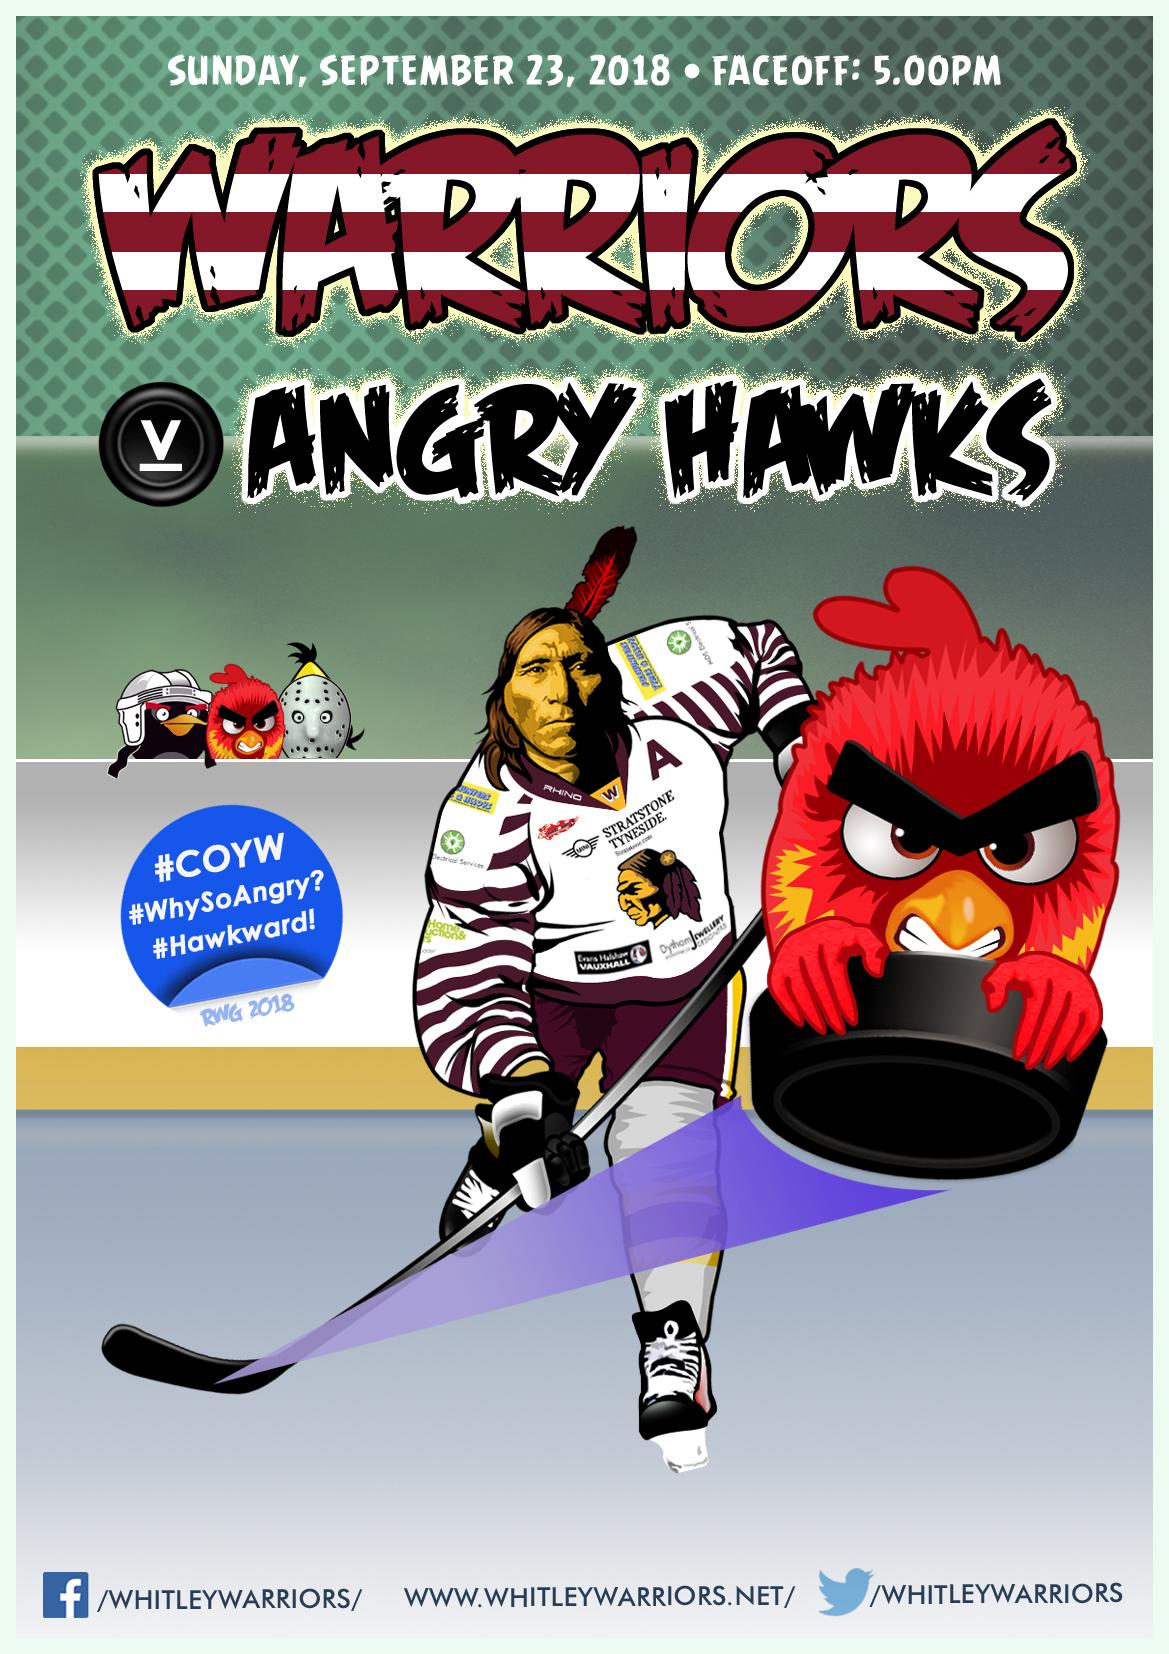 Whitley Warriors vs Blackburn Hawks @ Whitley Bay Ice Rink, Sunday 23 September, face off 5pm